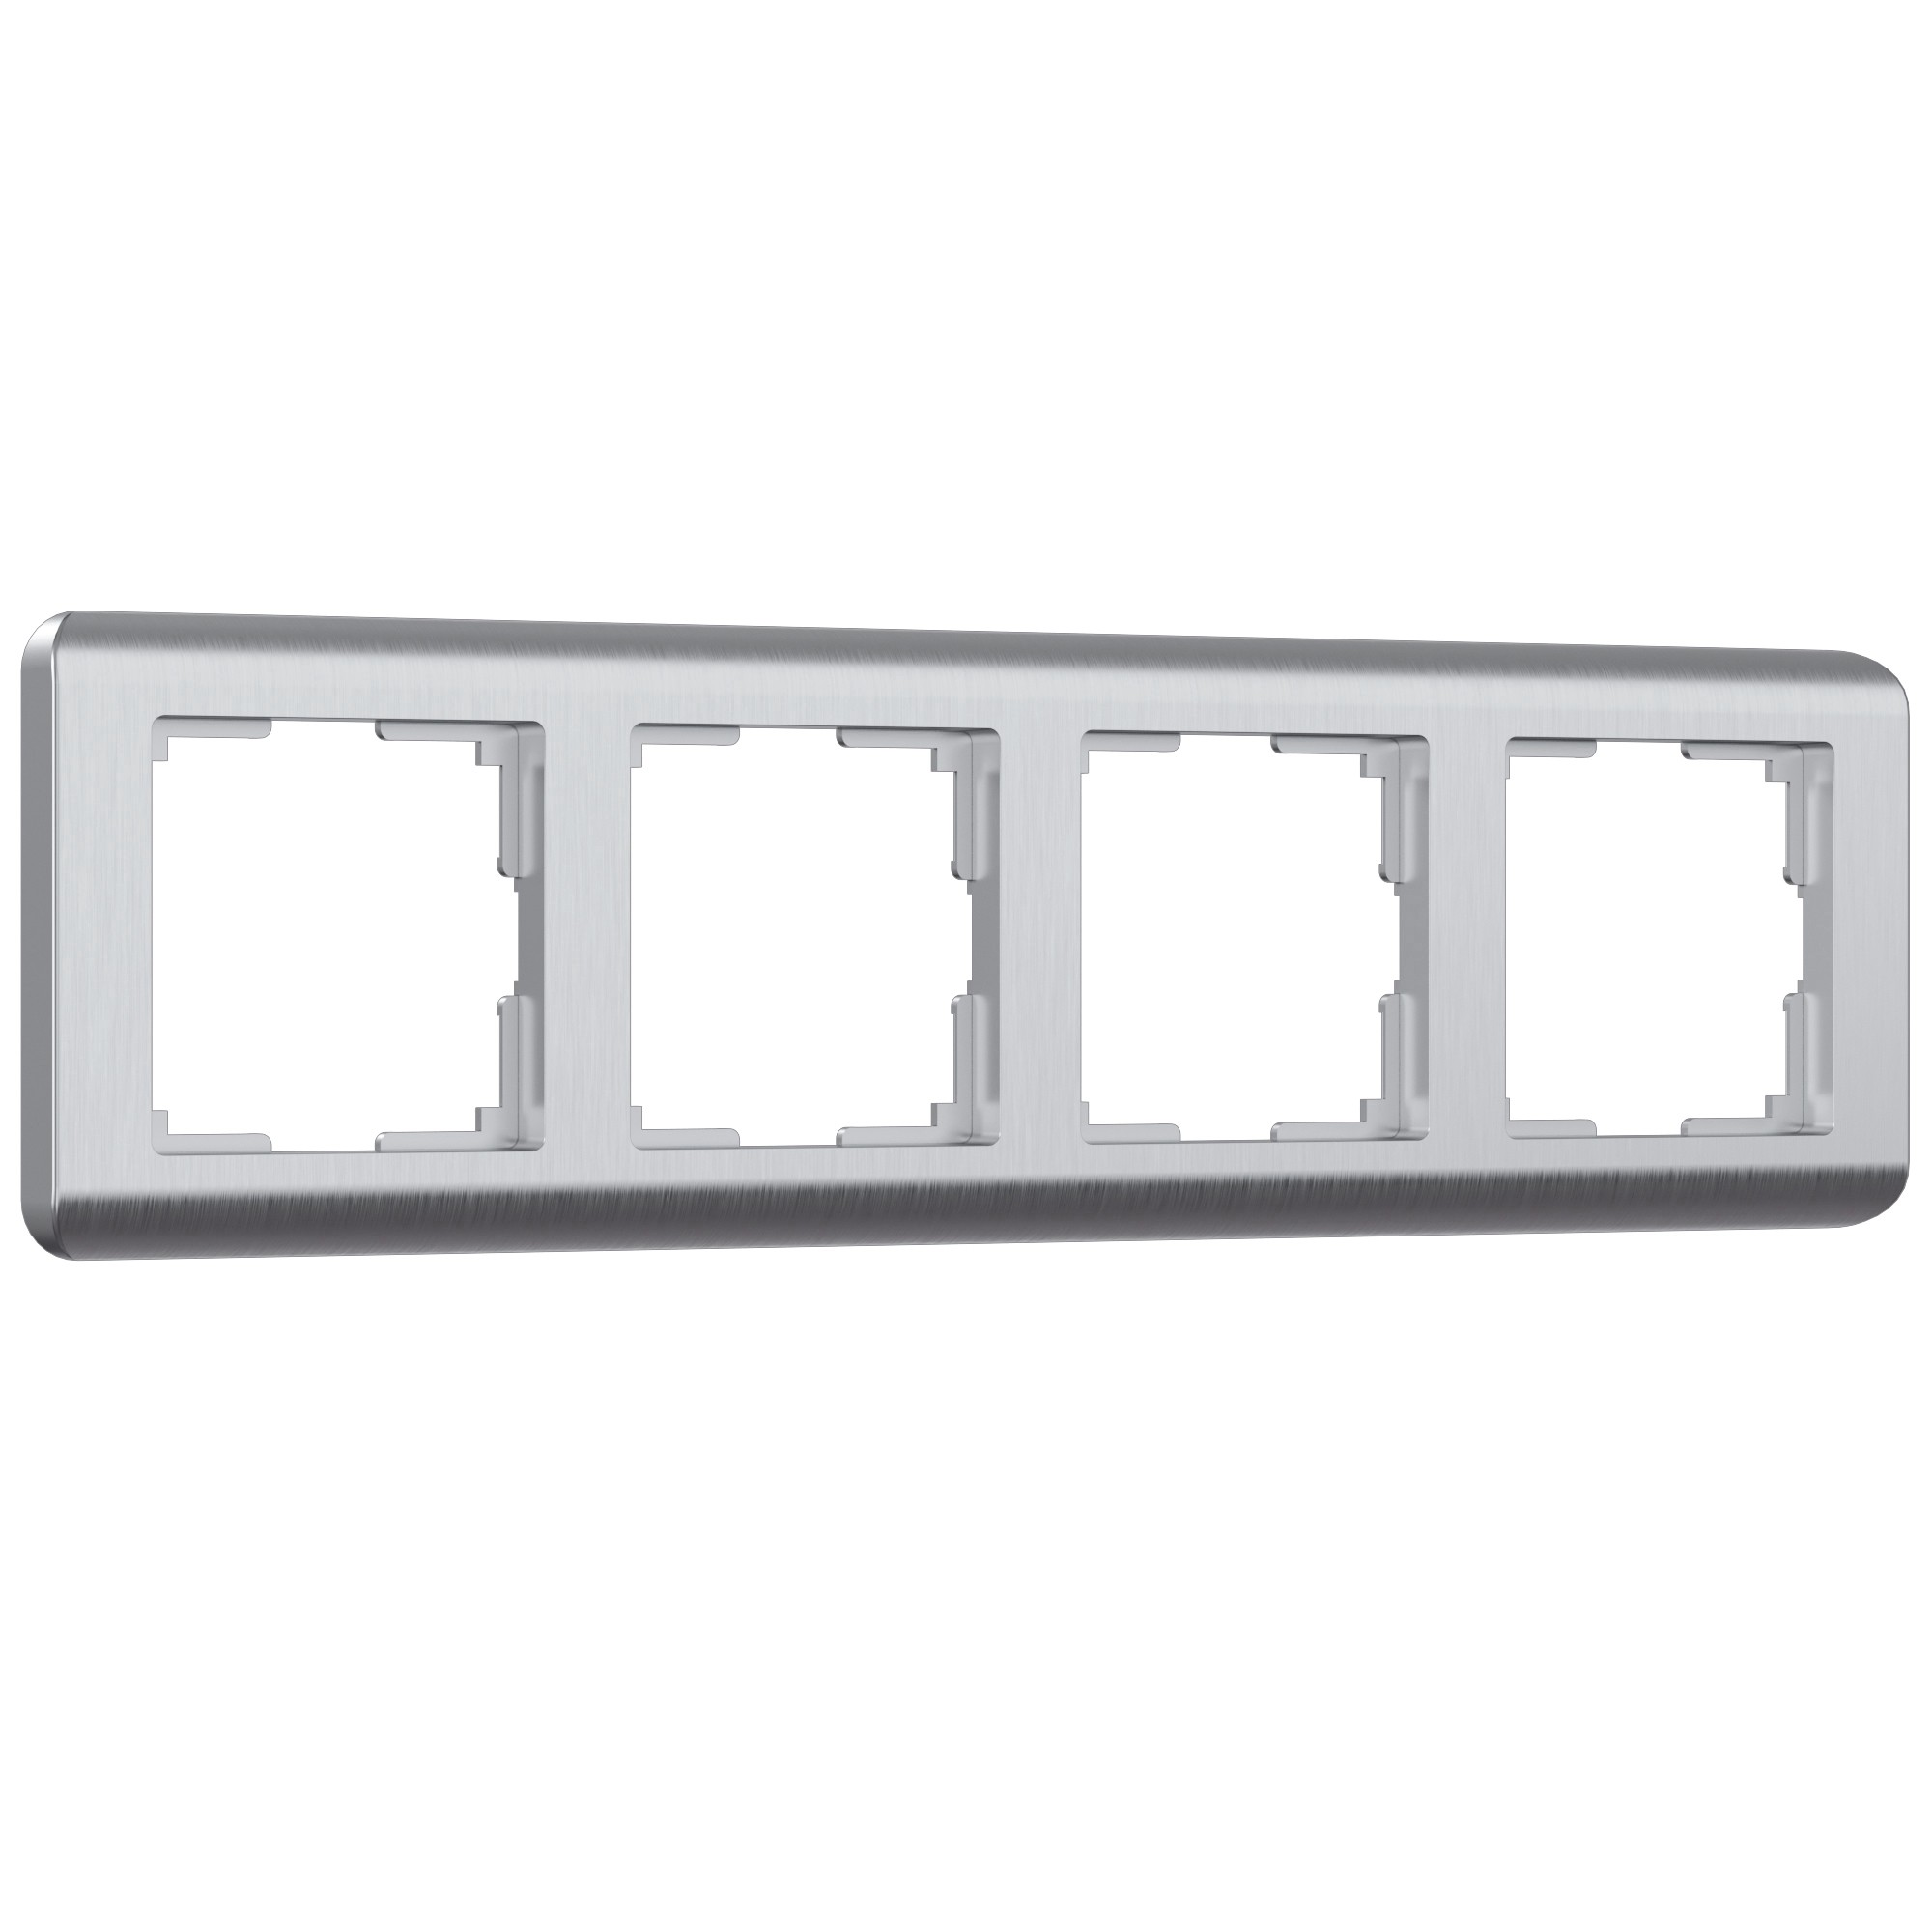 WL12-Frame-04 / Рамка на 4 поста  (серебряный)